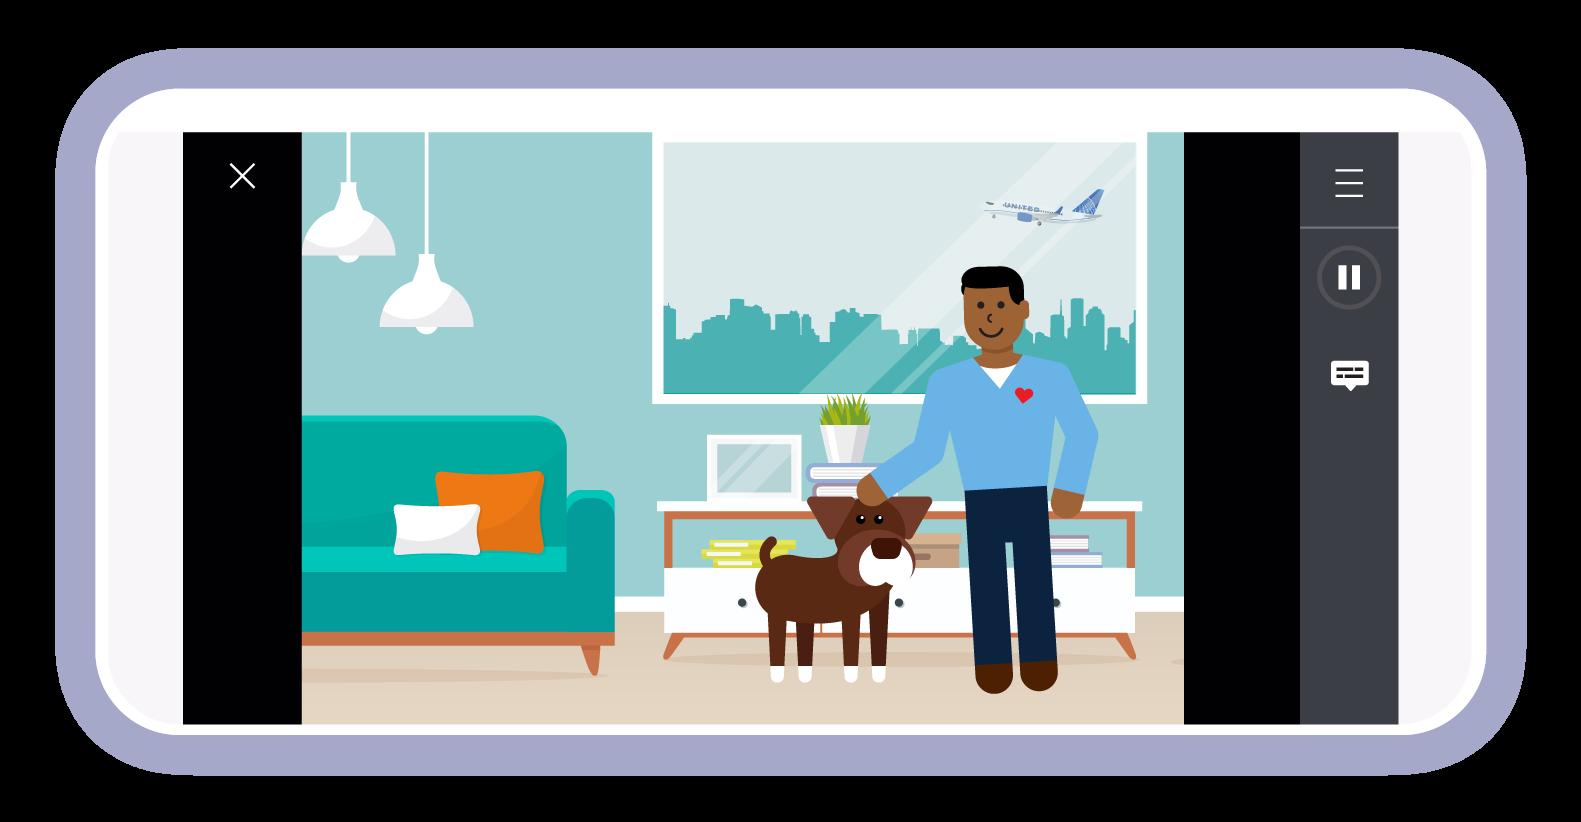 PetSafe full width image